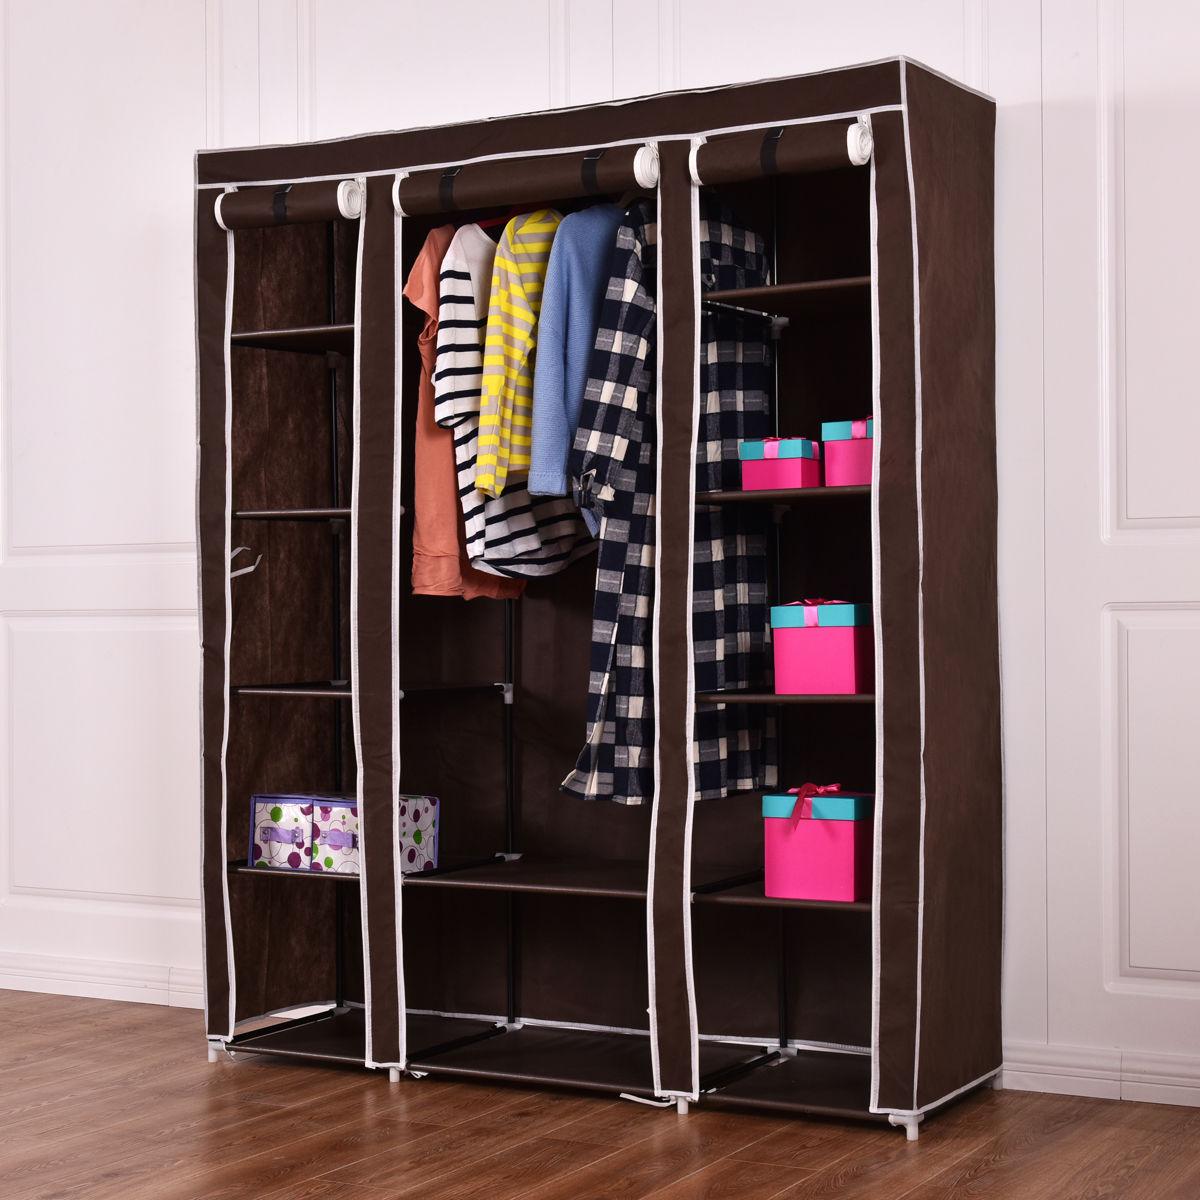 wardrobe closet costway 70u0027u0027 portable closet storage organizer clothes wardrobe shoe rack  w/shelves brown IHIUDQJ